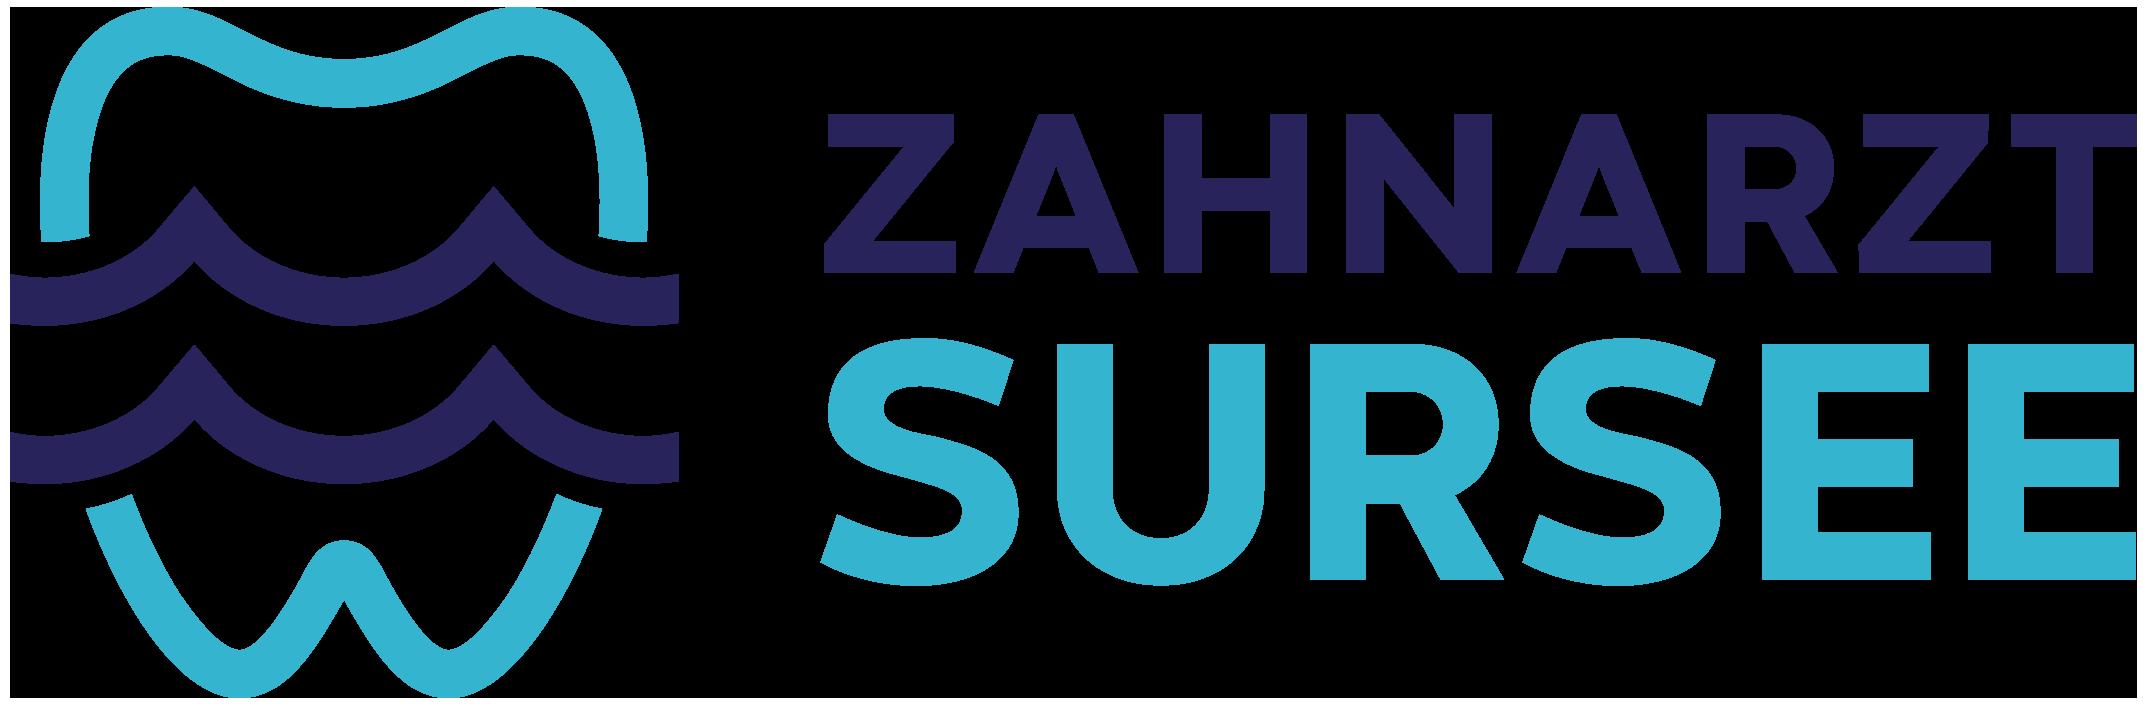 Images Zahnarzt Sursee